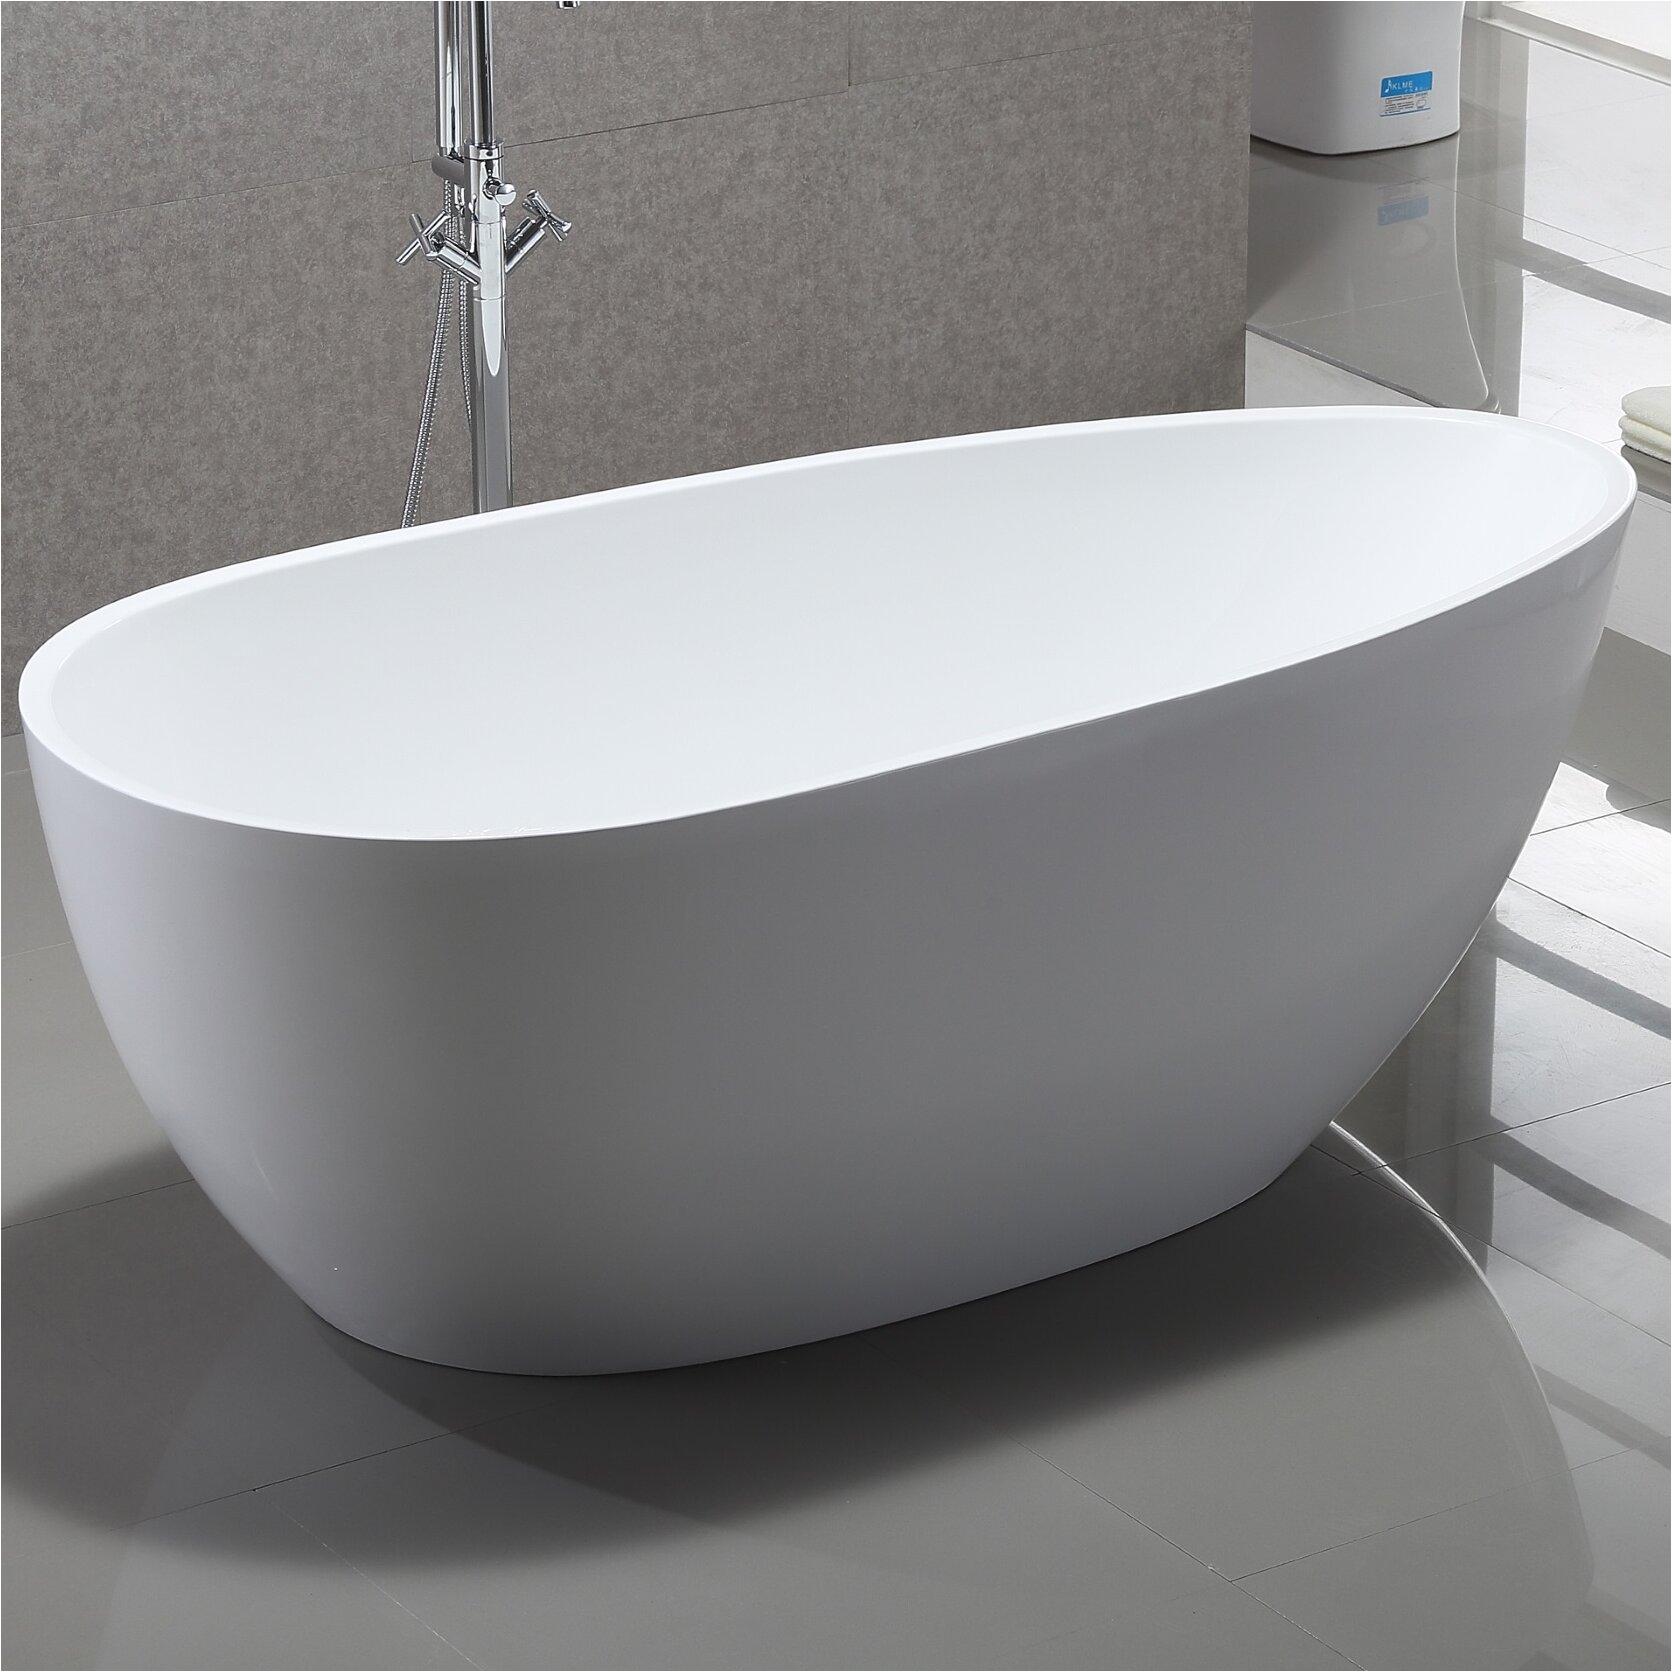 Vanity Art 59 x 29 5 Freestanding Soaking Bathtub VNAR1015